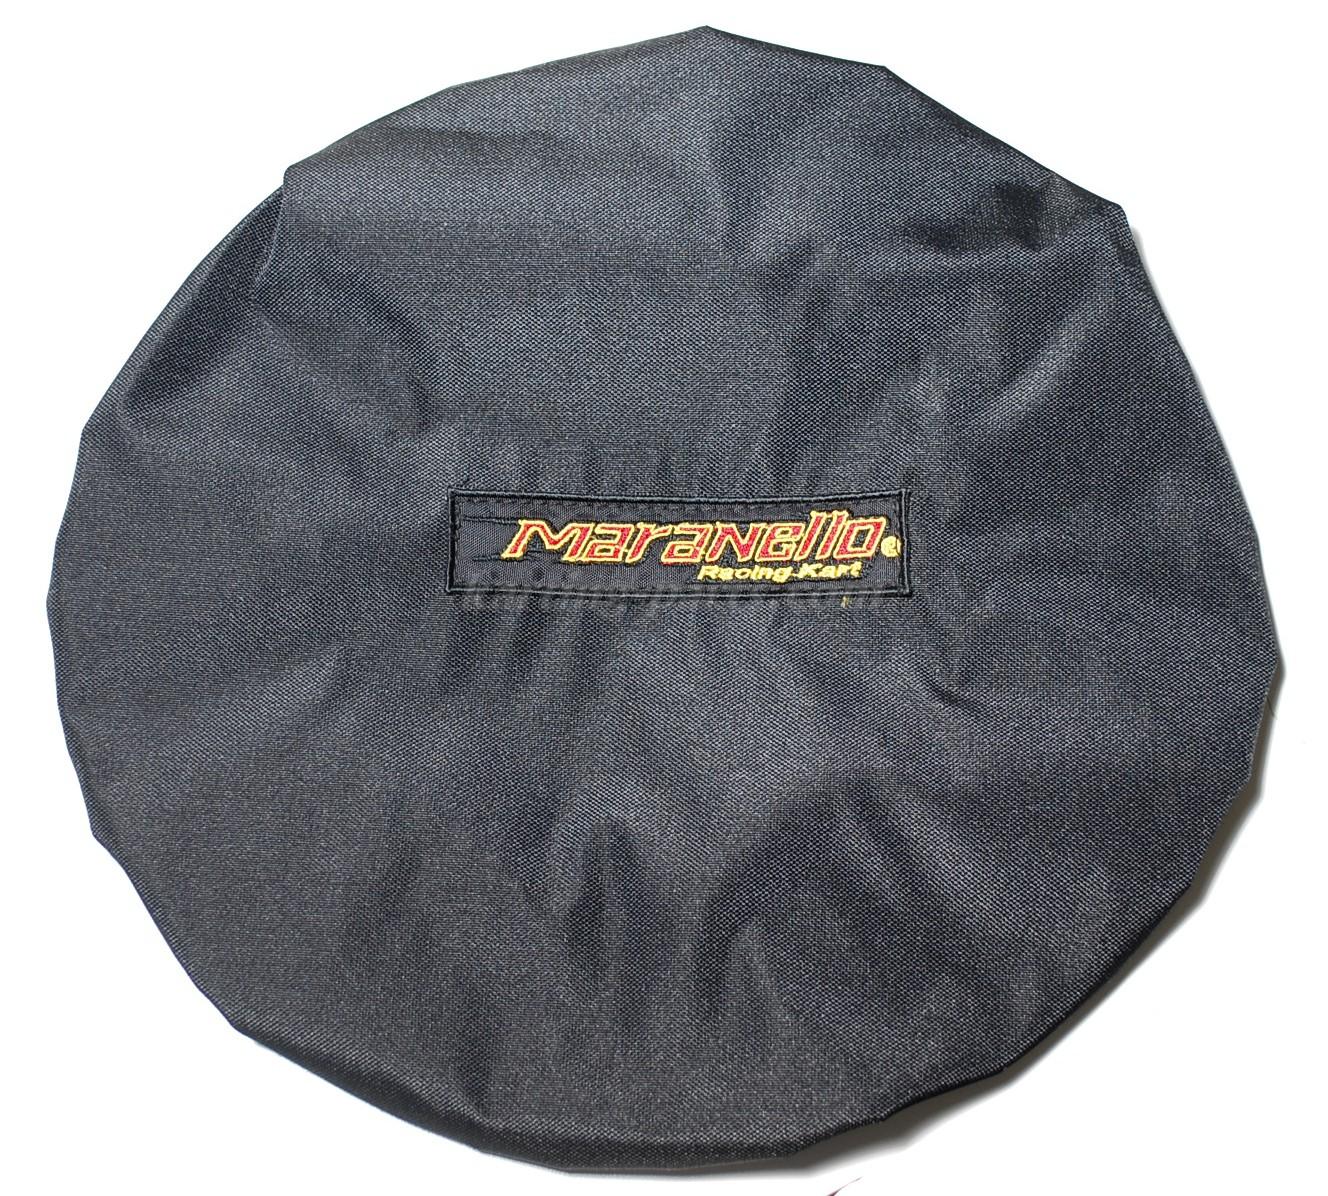 Steering wheel cover Maranello